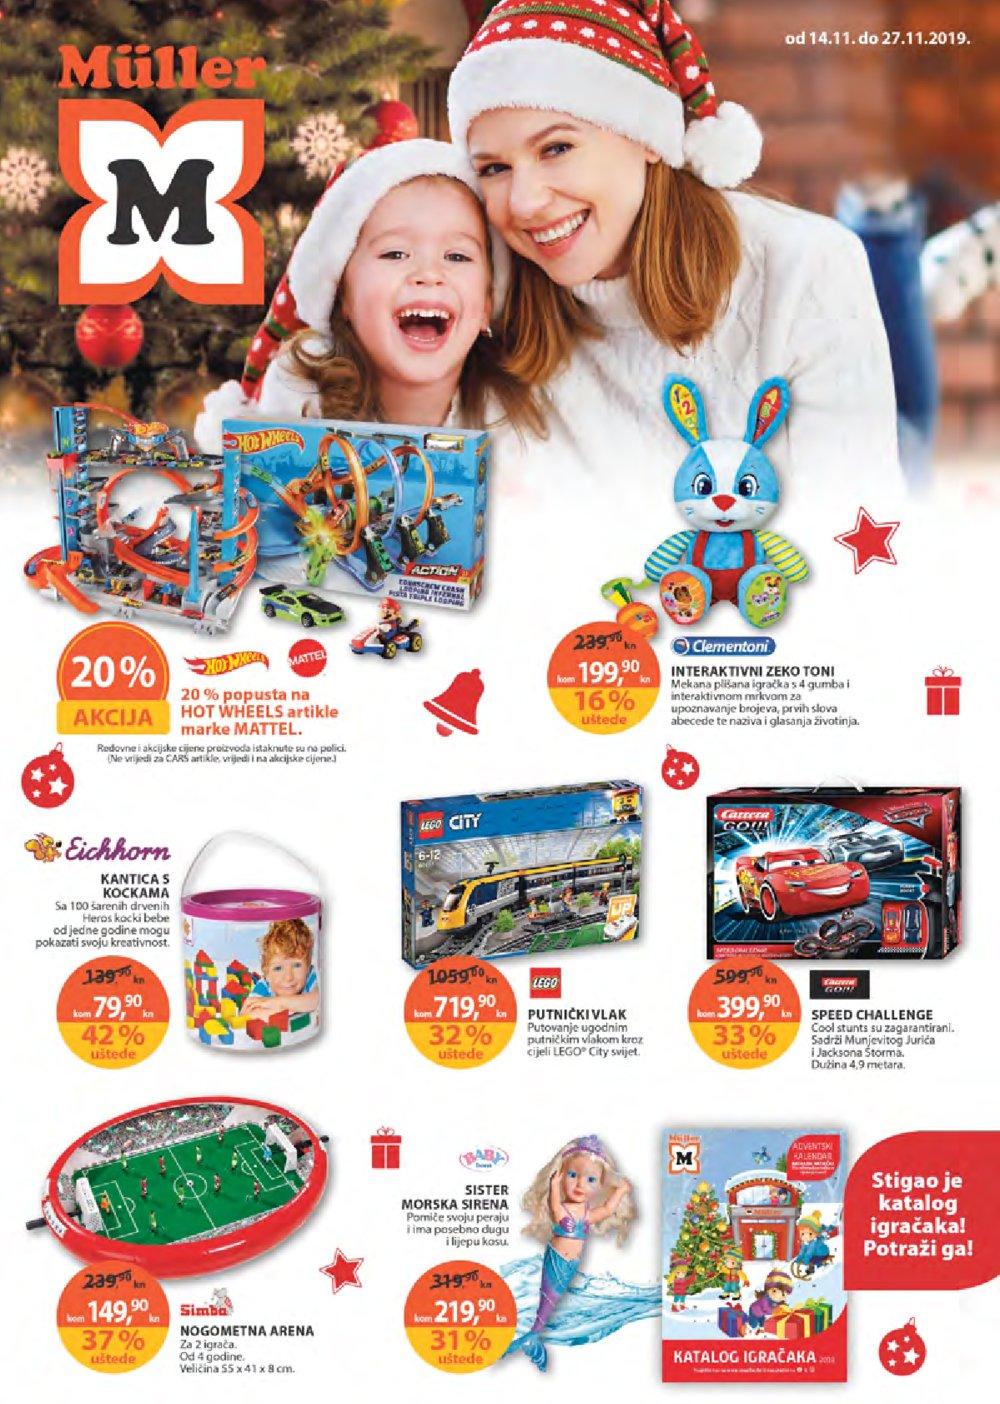 Muller katalog igračke 14.11.-27.11.2019.